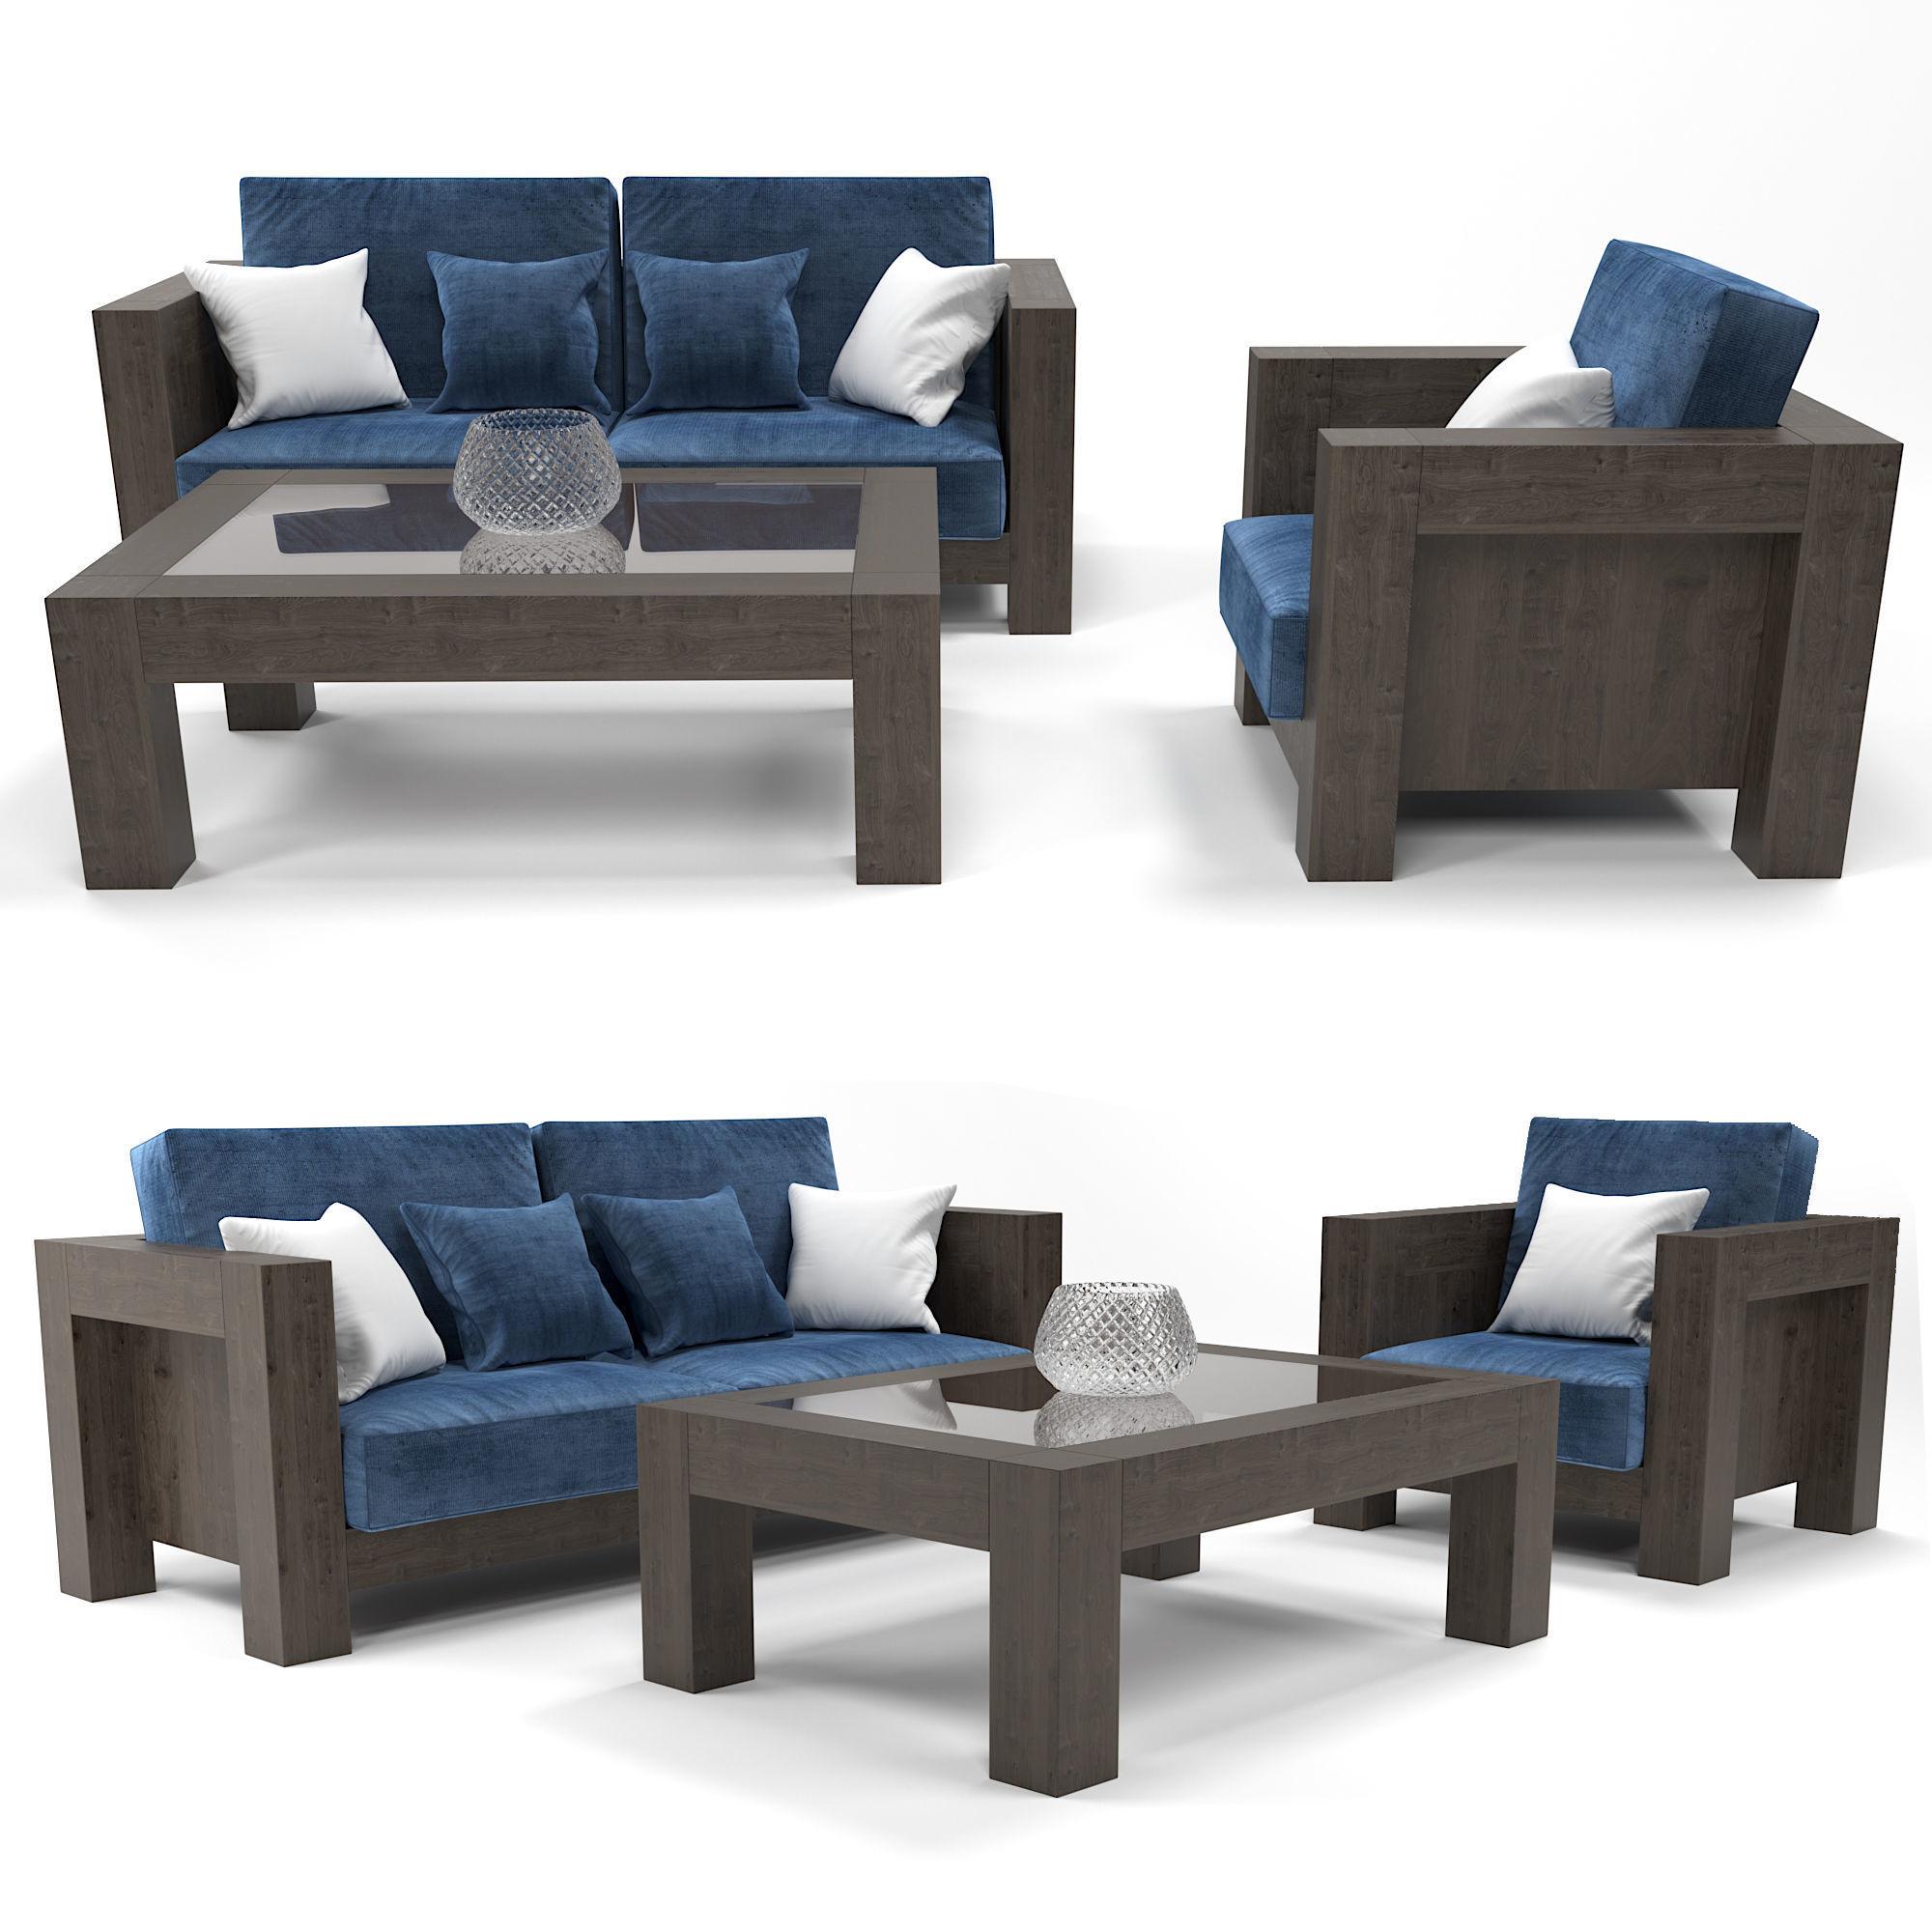 Modern Wooden Sofa Model